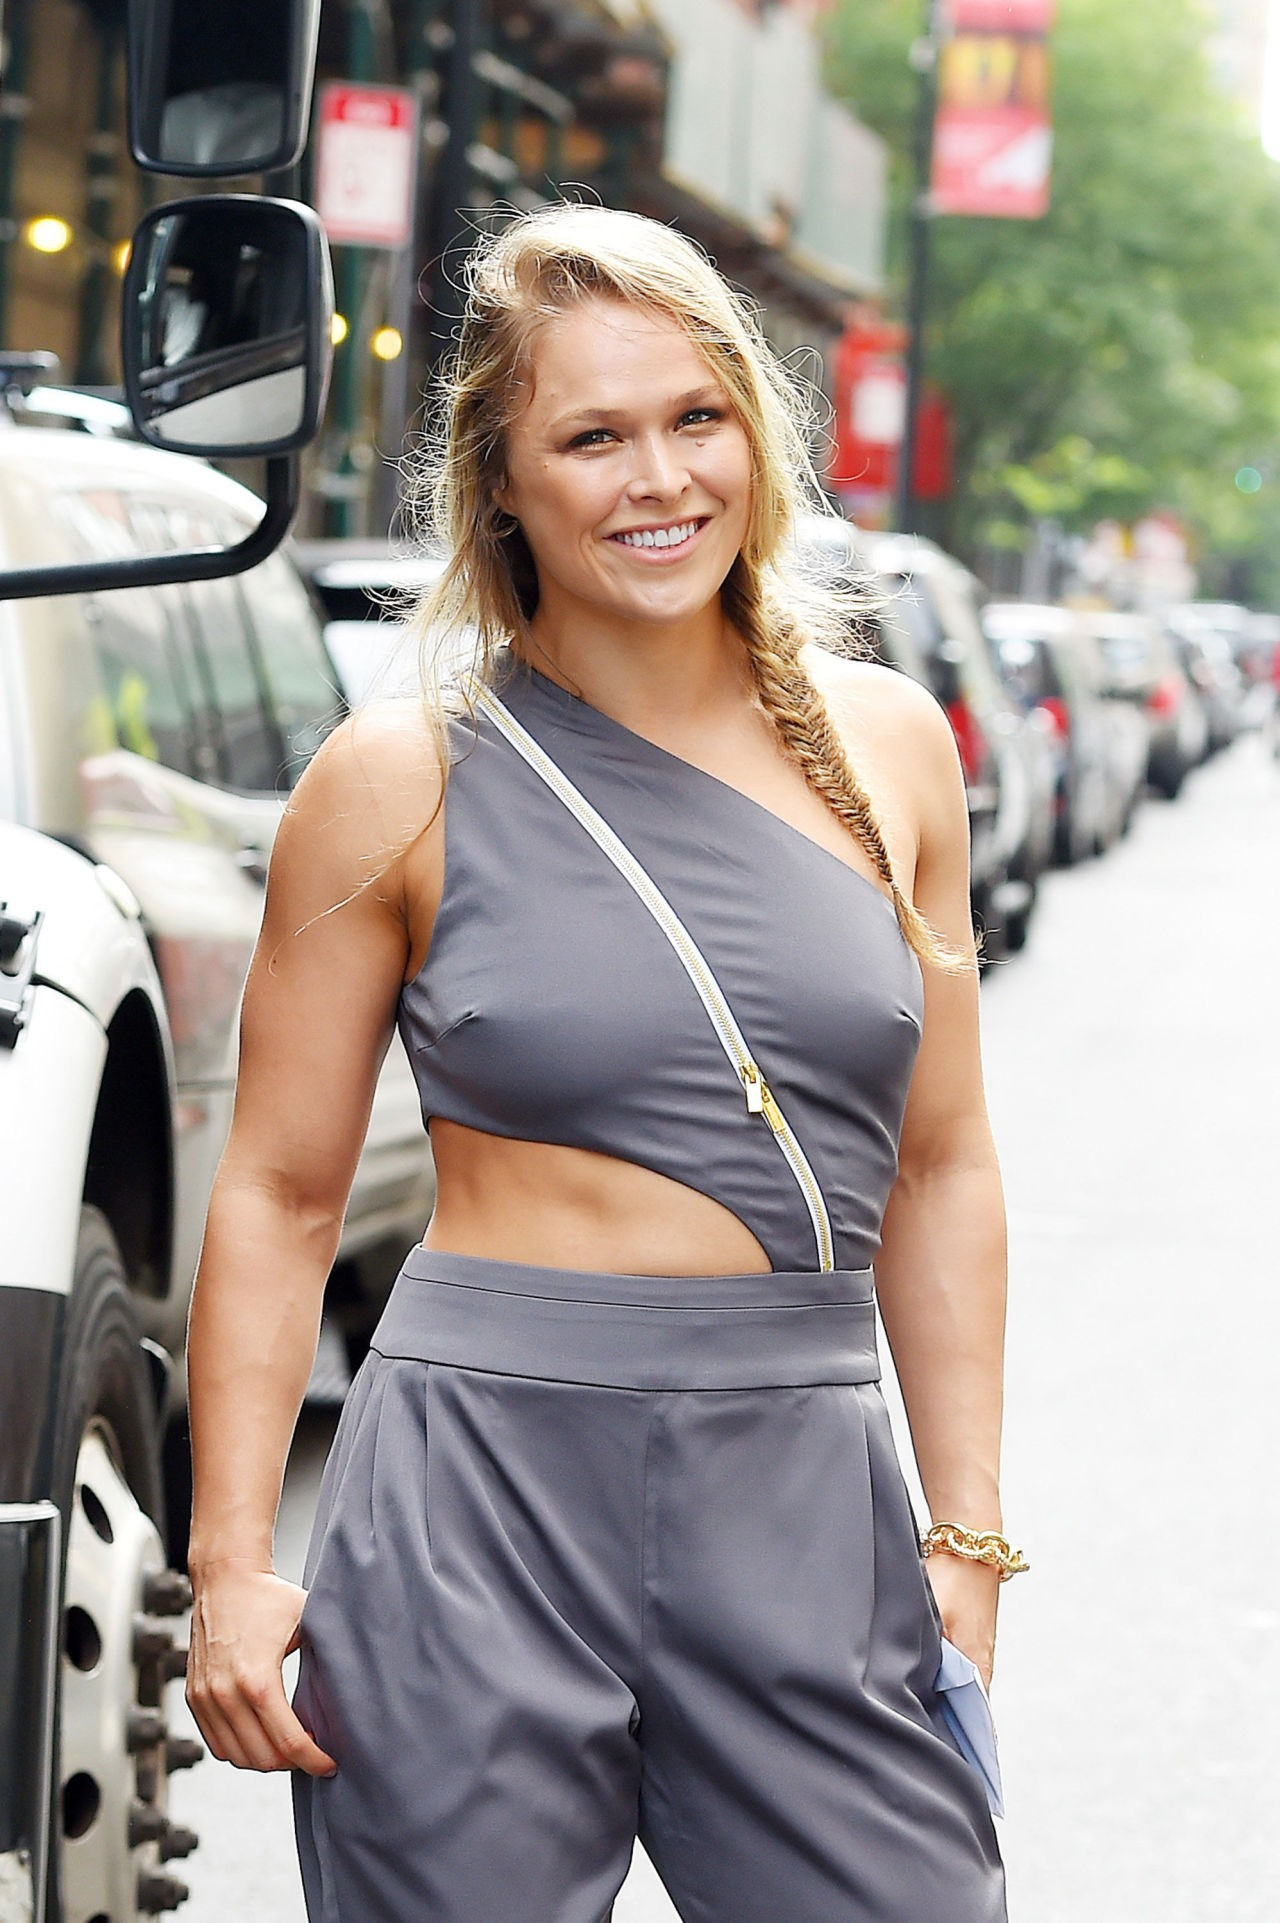 Ronda Rousey photoshoot